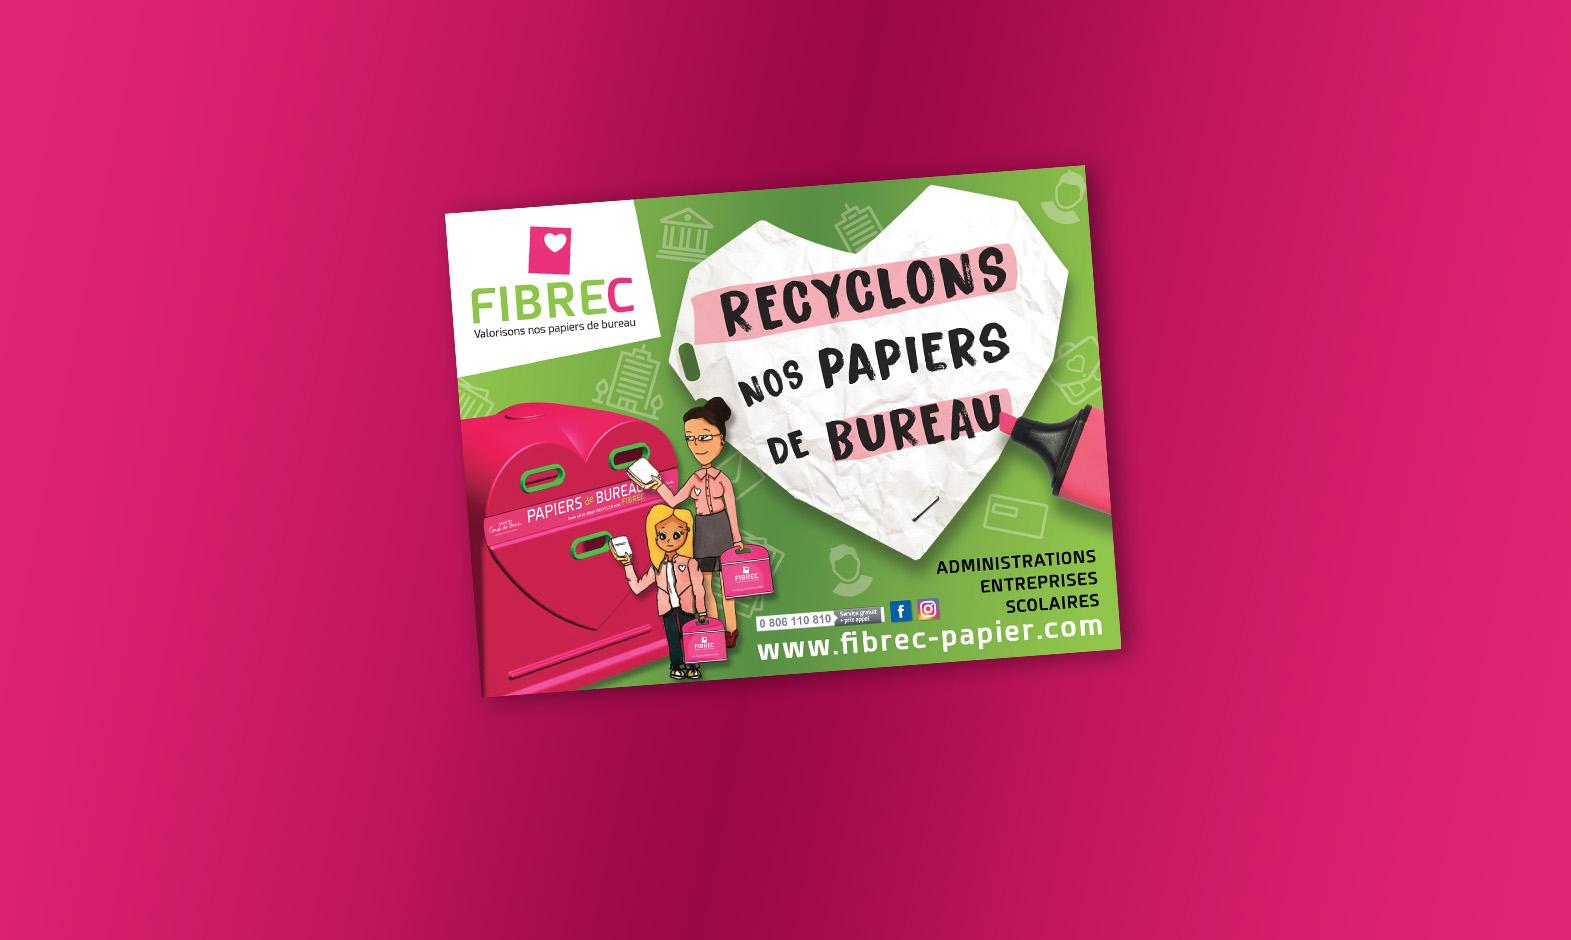 Fibrec papier bureau recycle